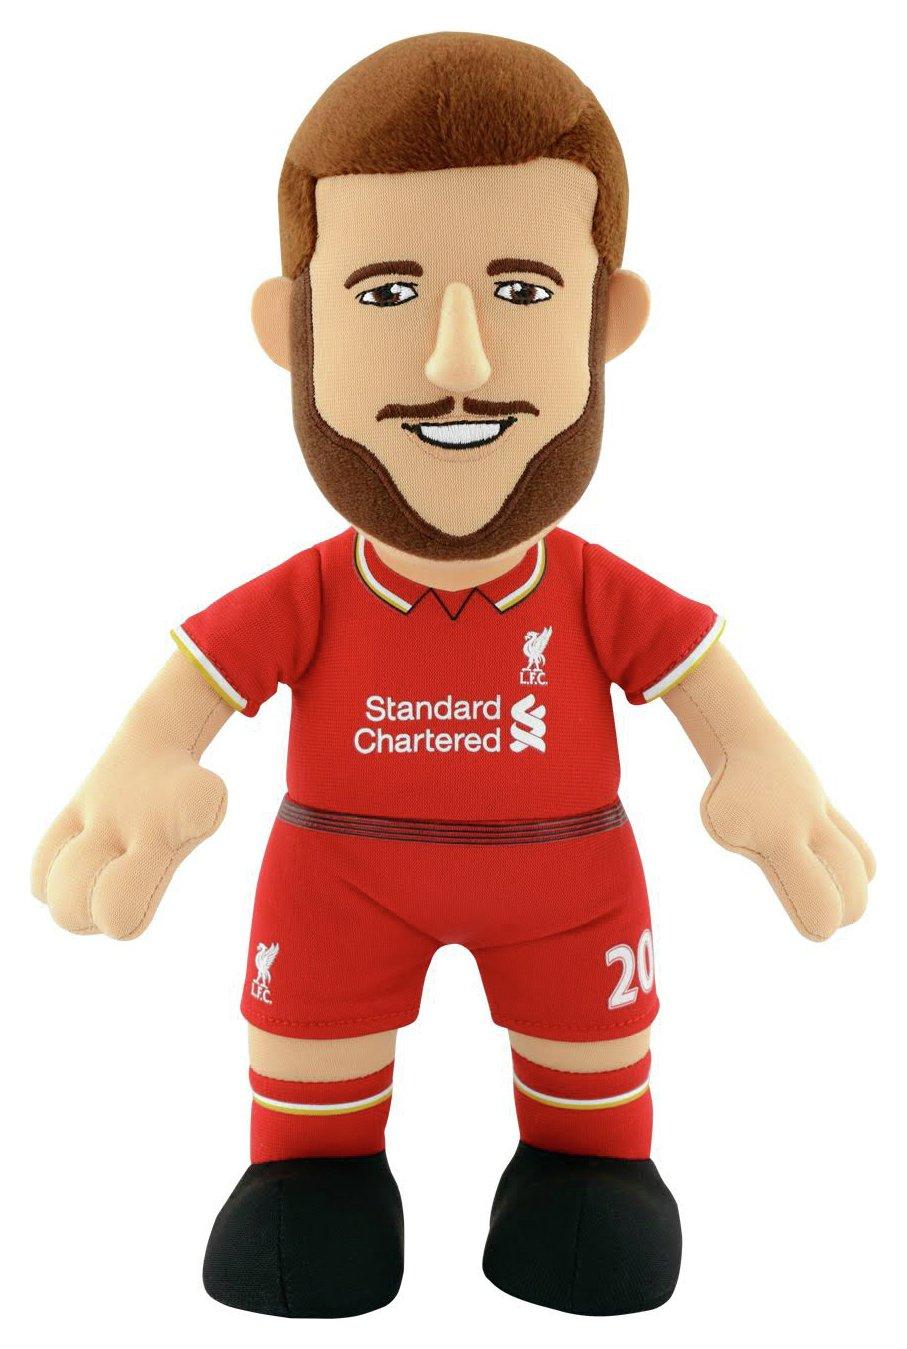 Image of Liverpool FC - Lallana - Creature - Plush Toy